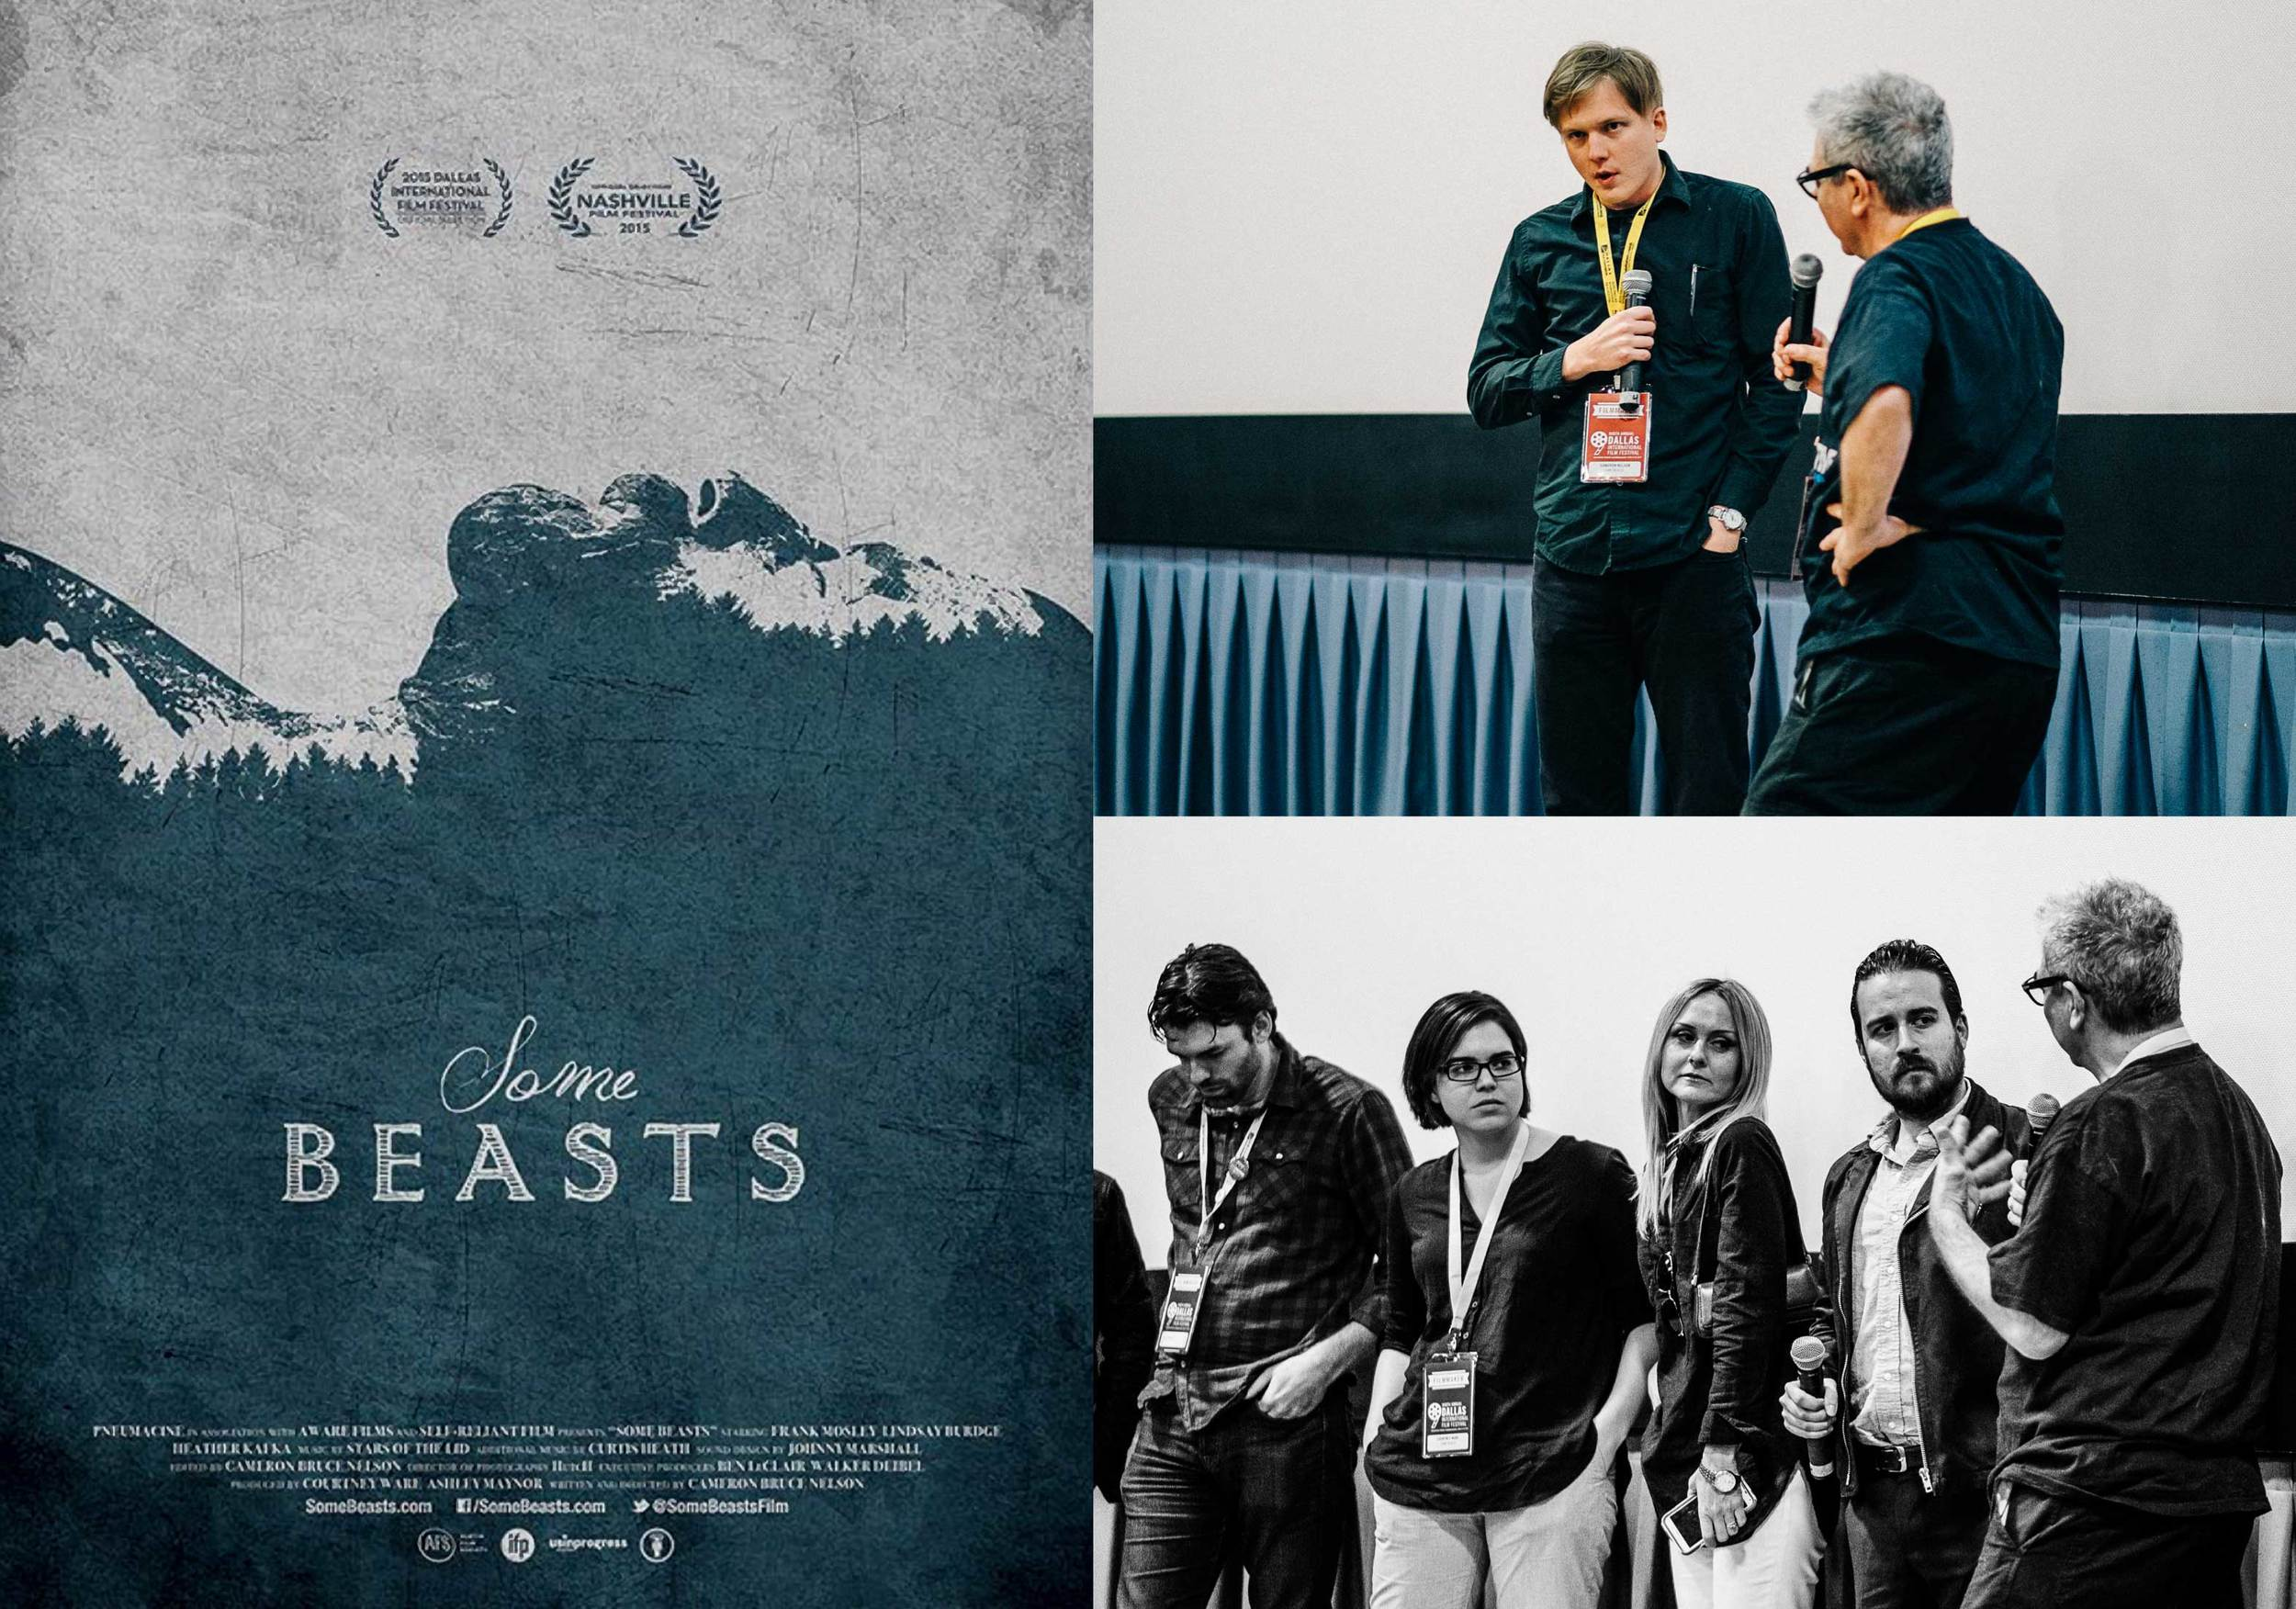 2015 Dallas International Film Festival premiere of SOME BEASTS.